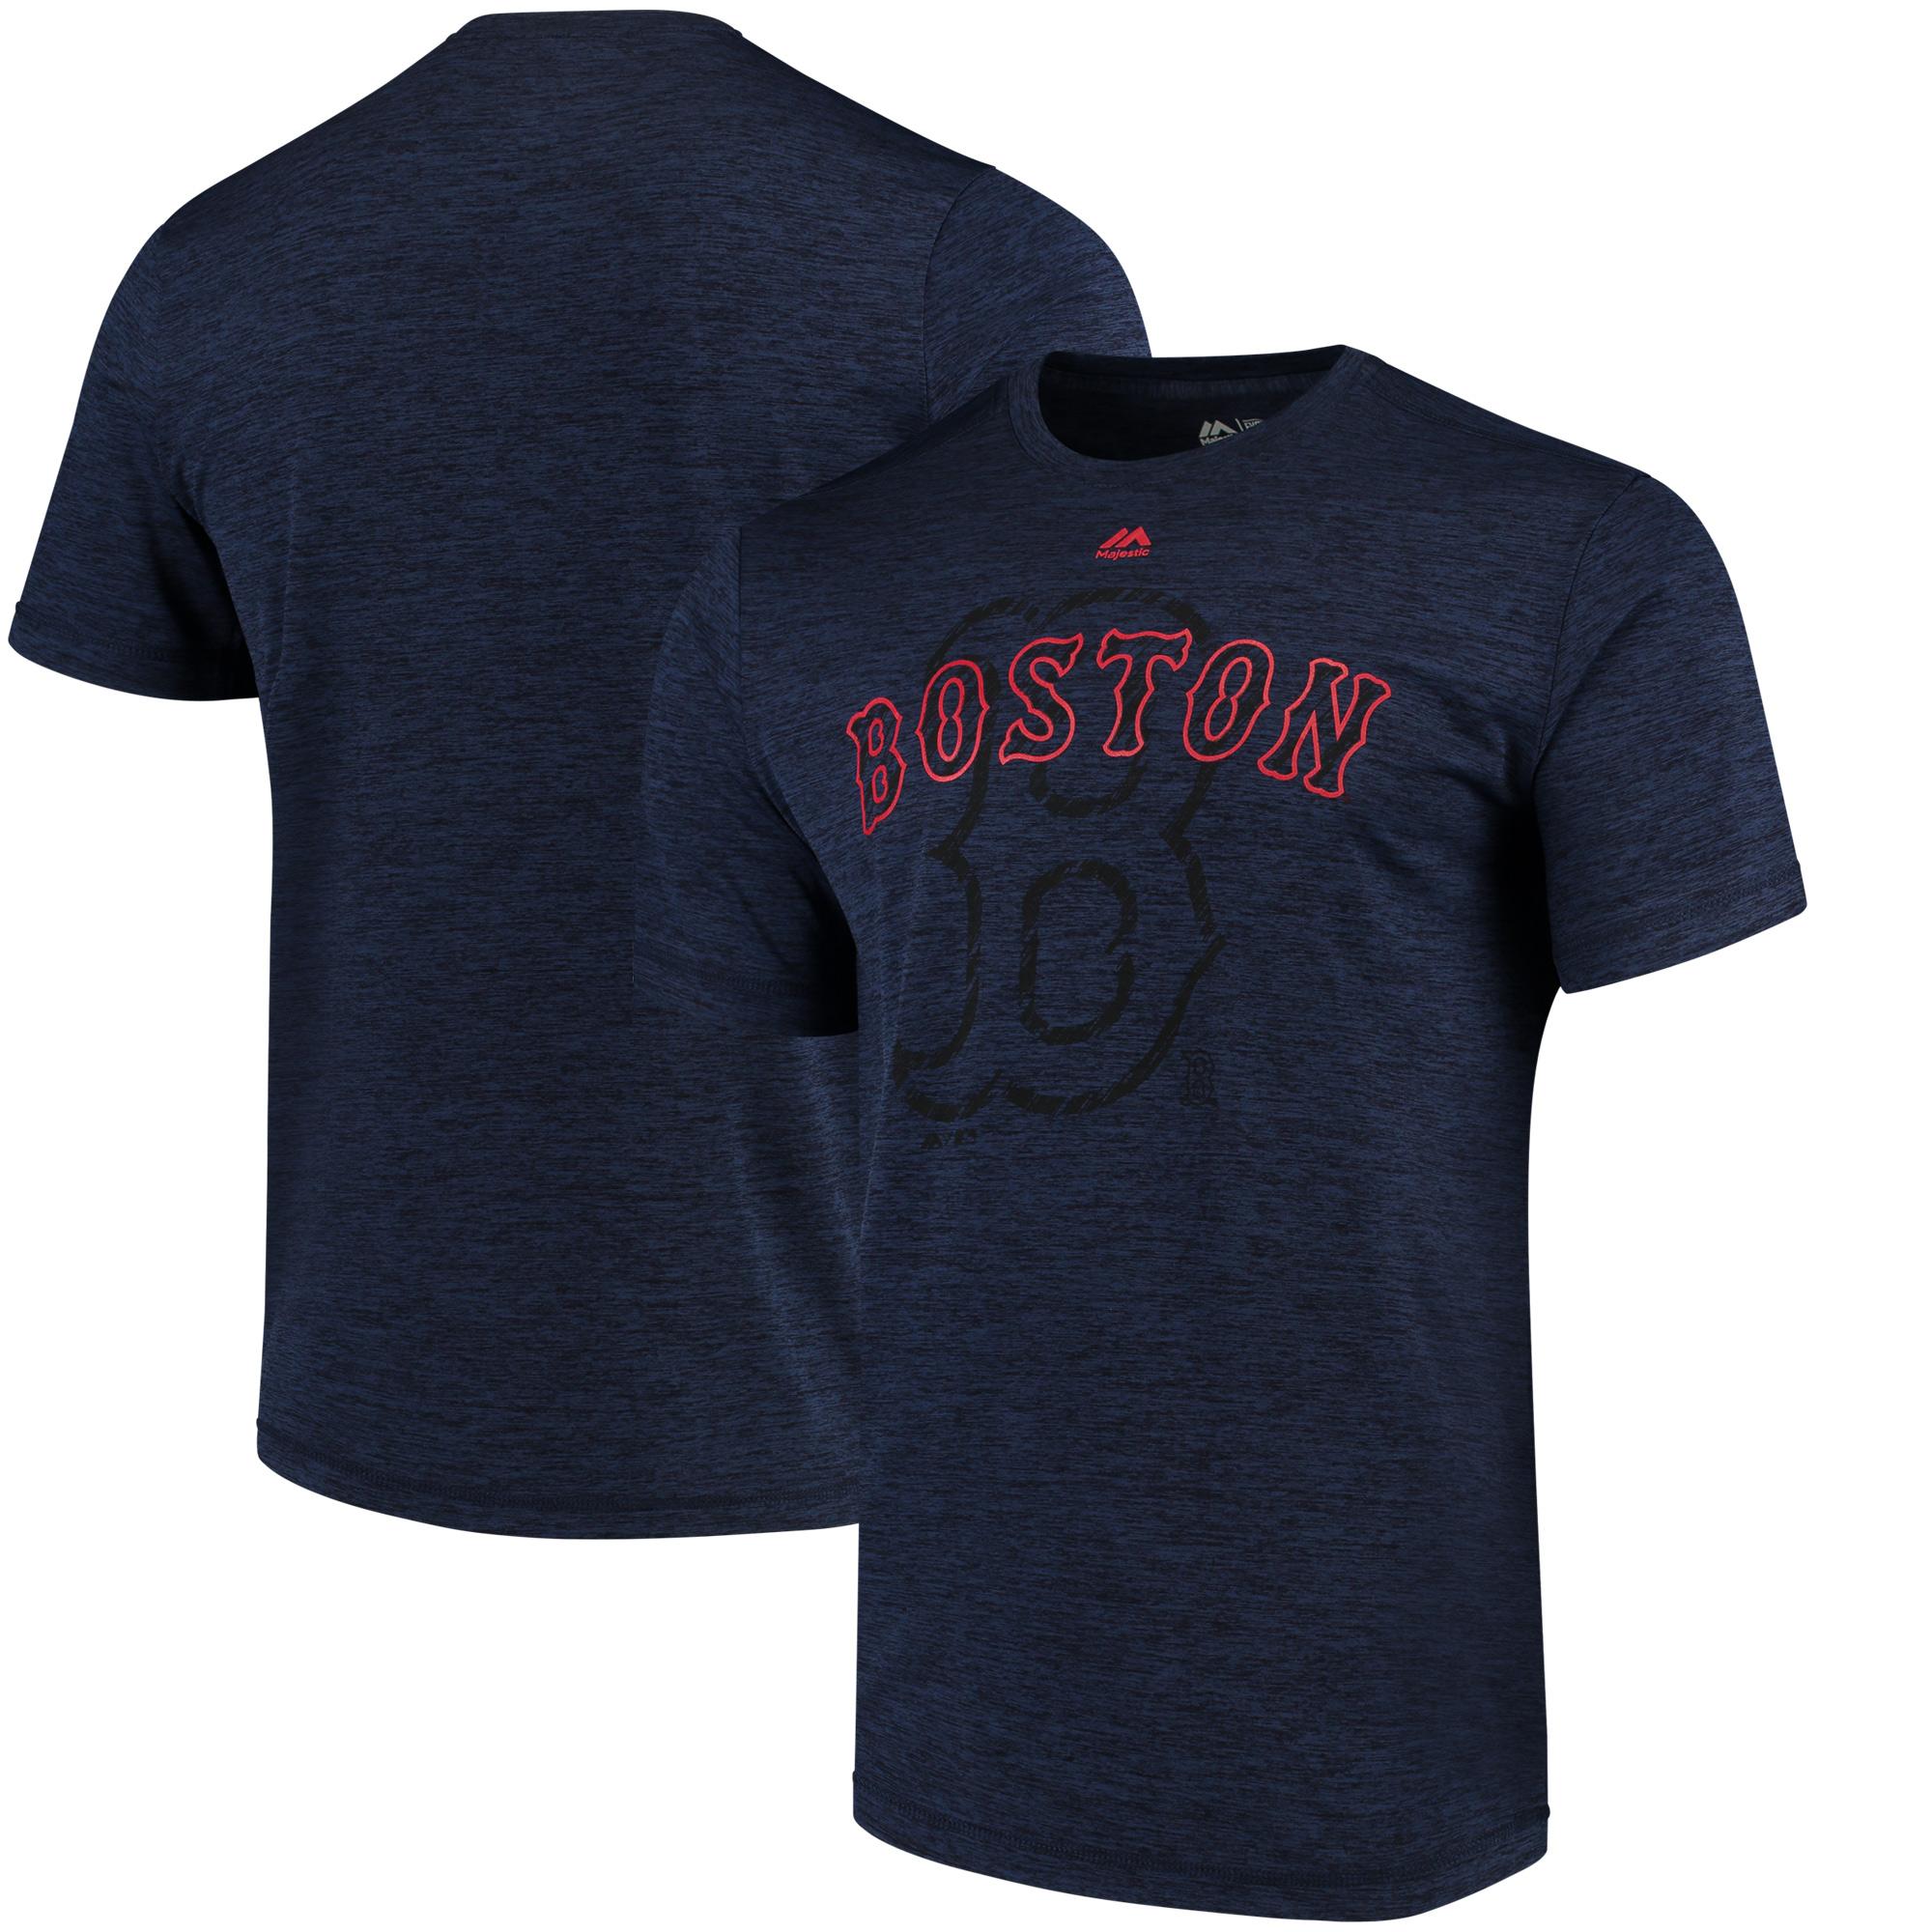 Men's Majestic Navy Boston Red Sox Razoredge T-Shirt